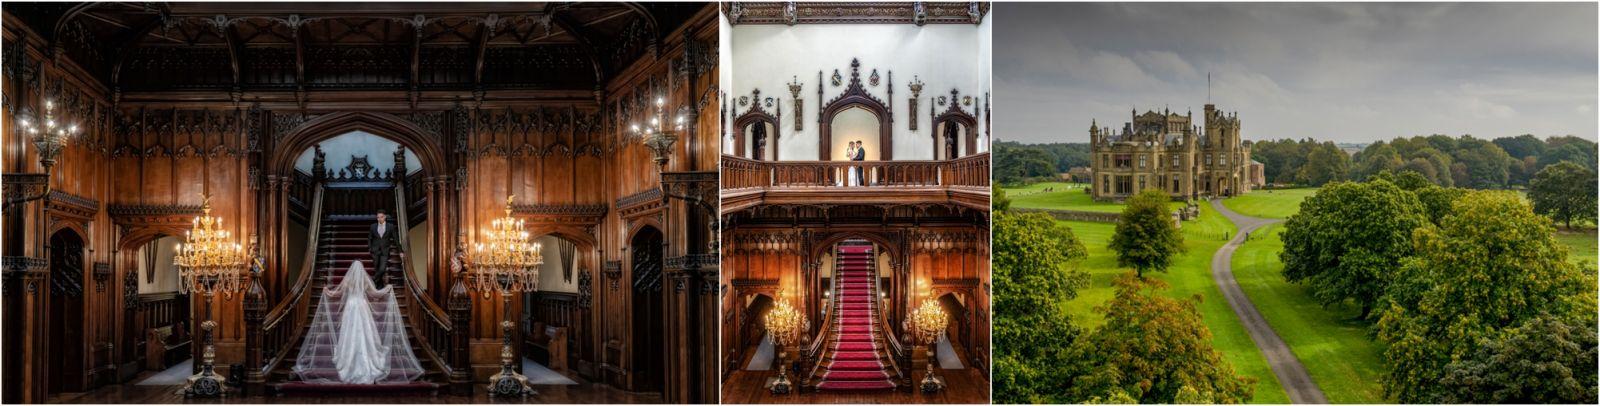 Allerton Castle Luxury Castle wedding photography workshop